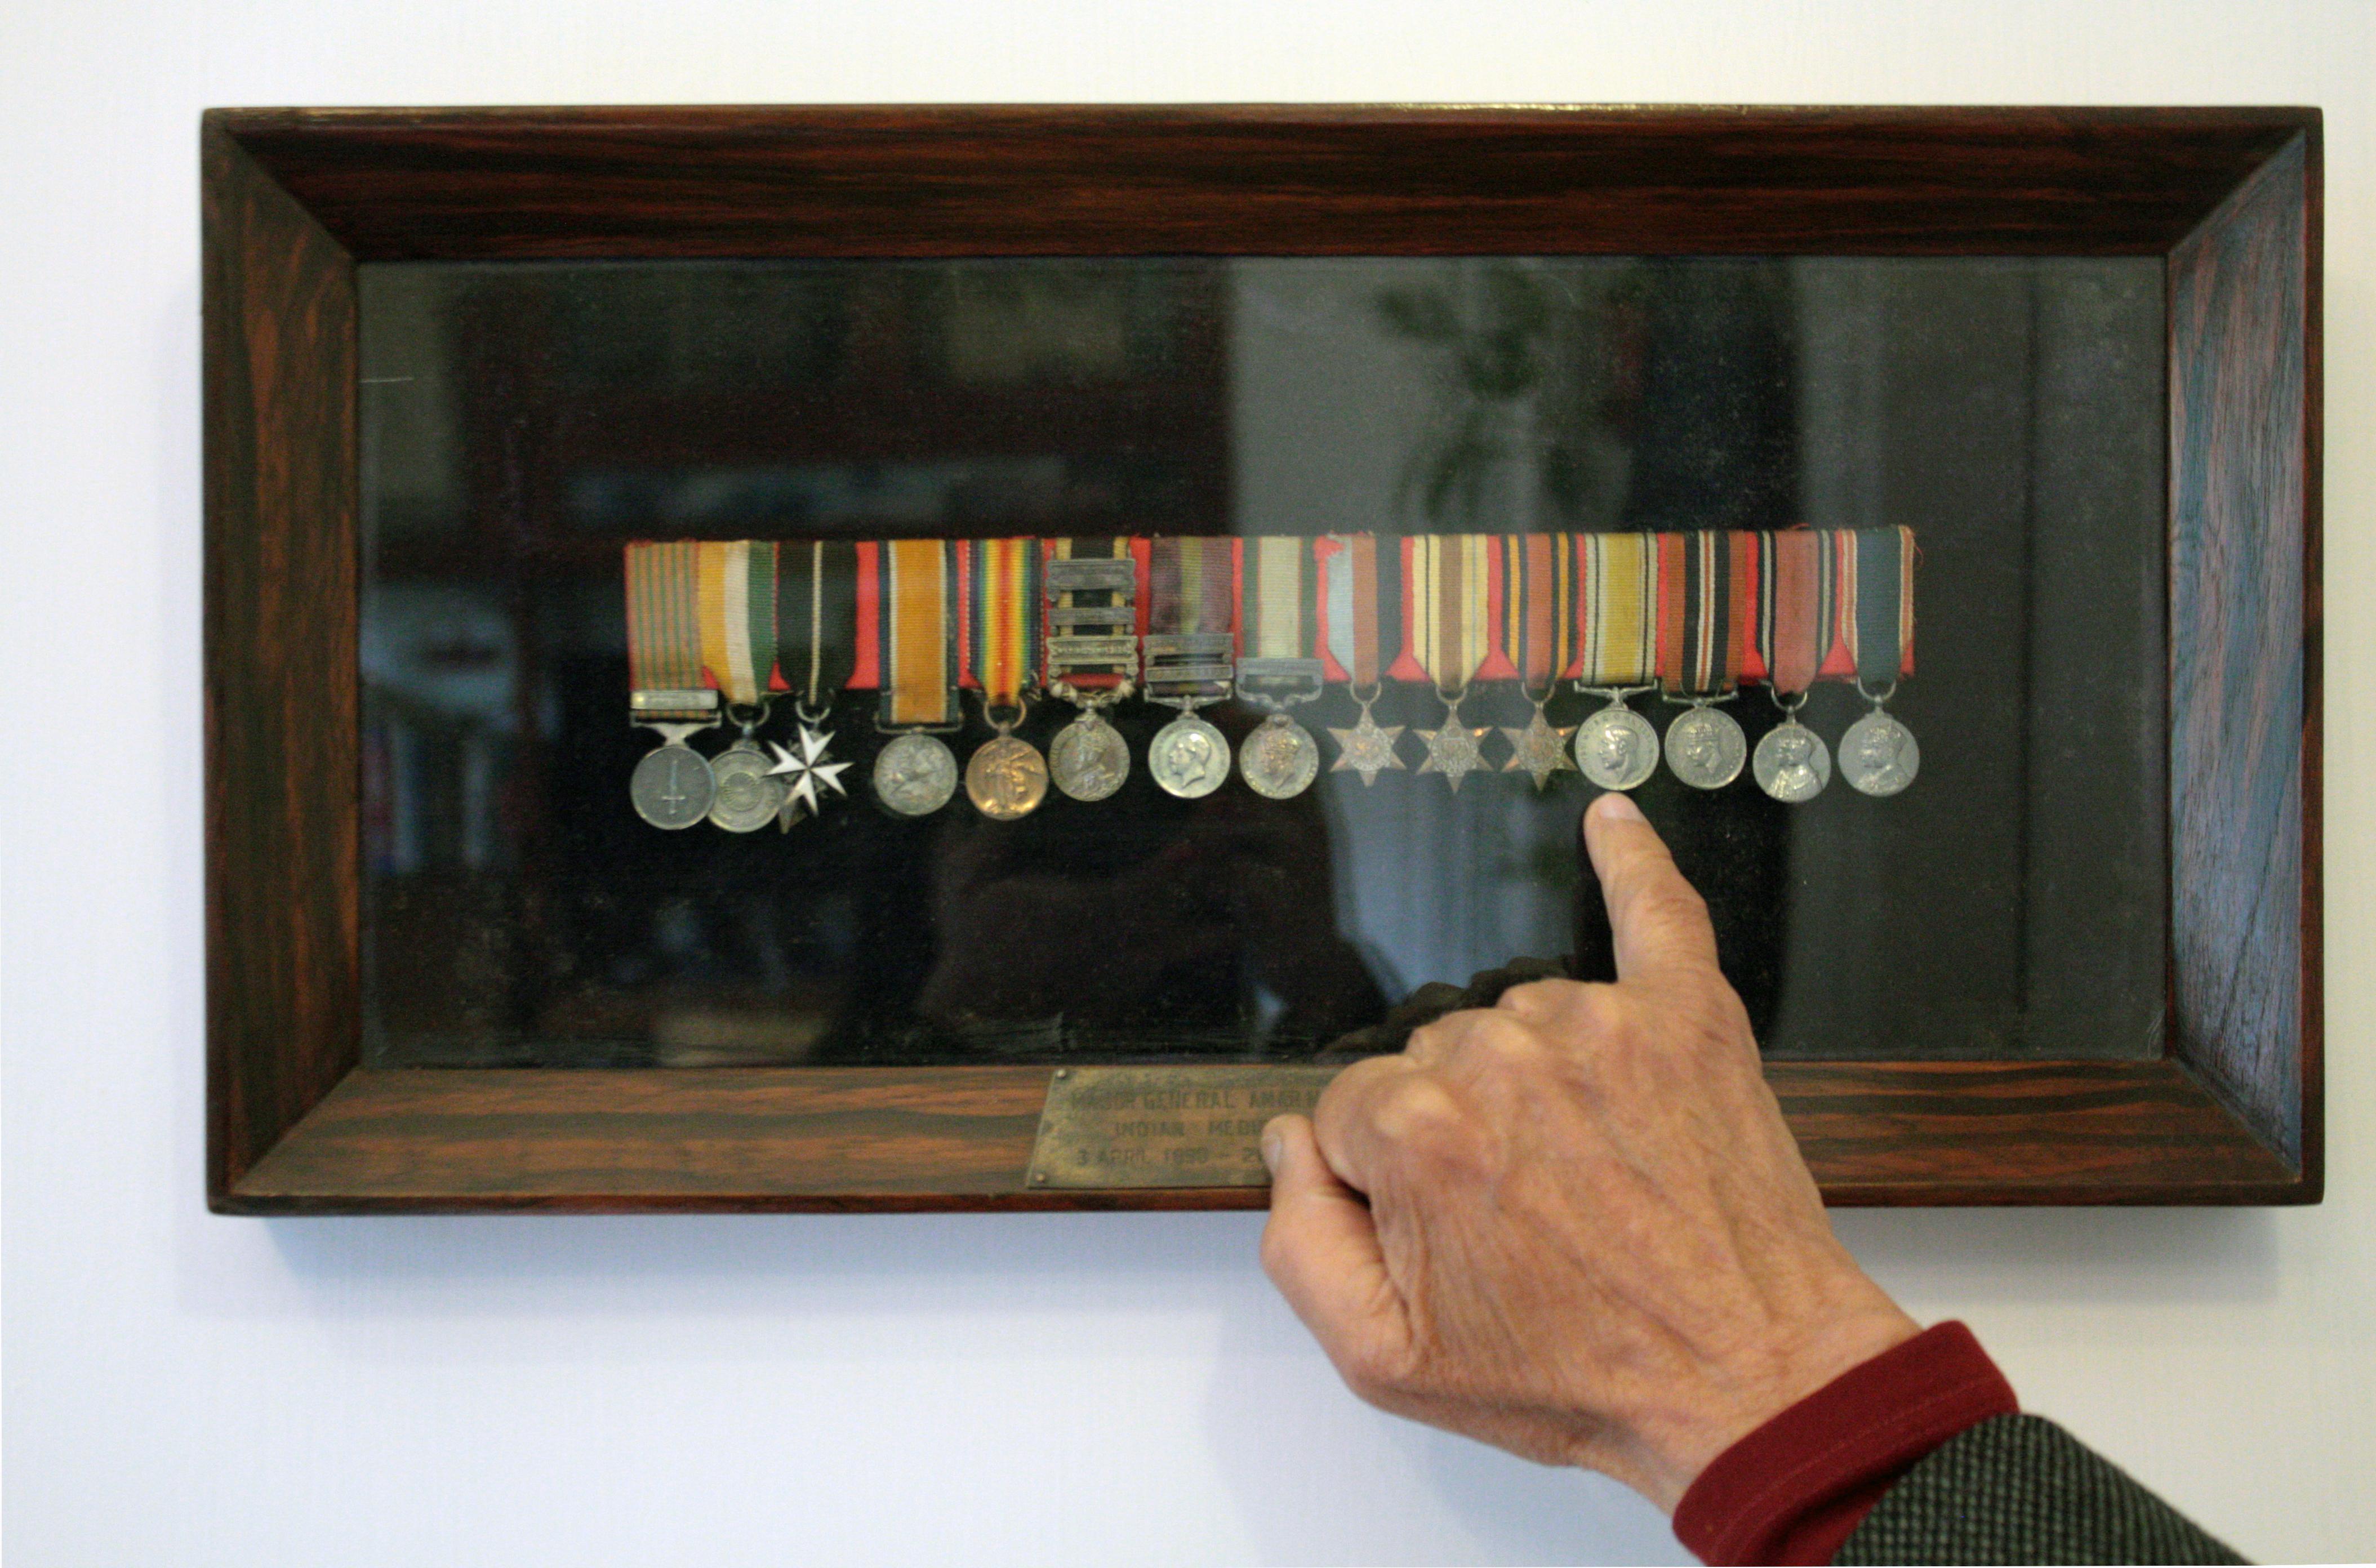 Lt. Gen SN Sharma